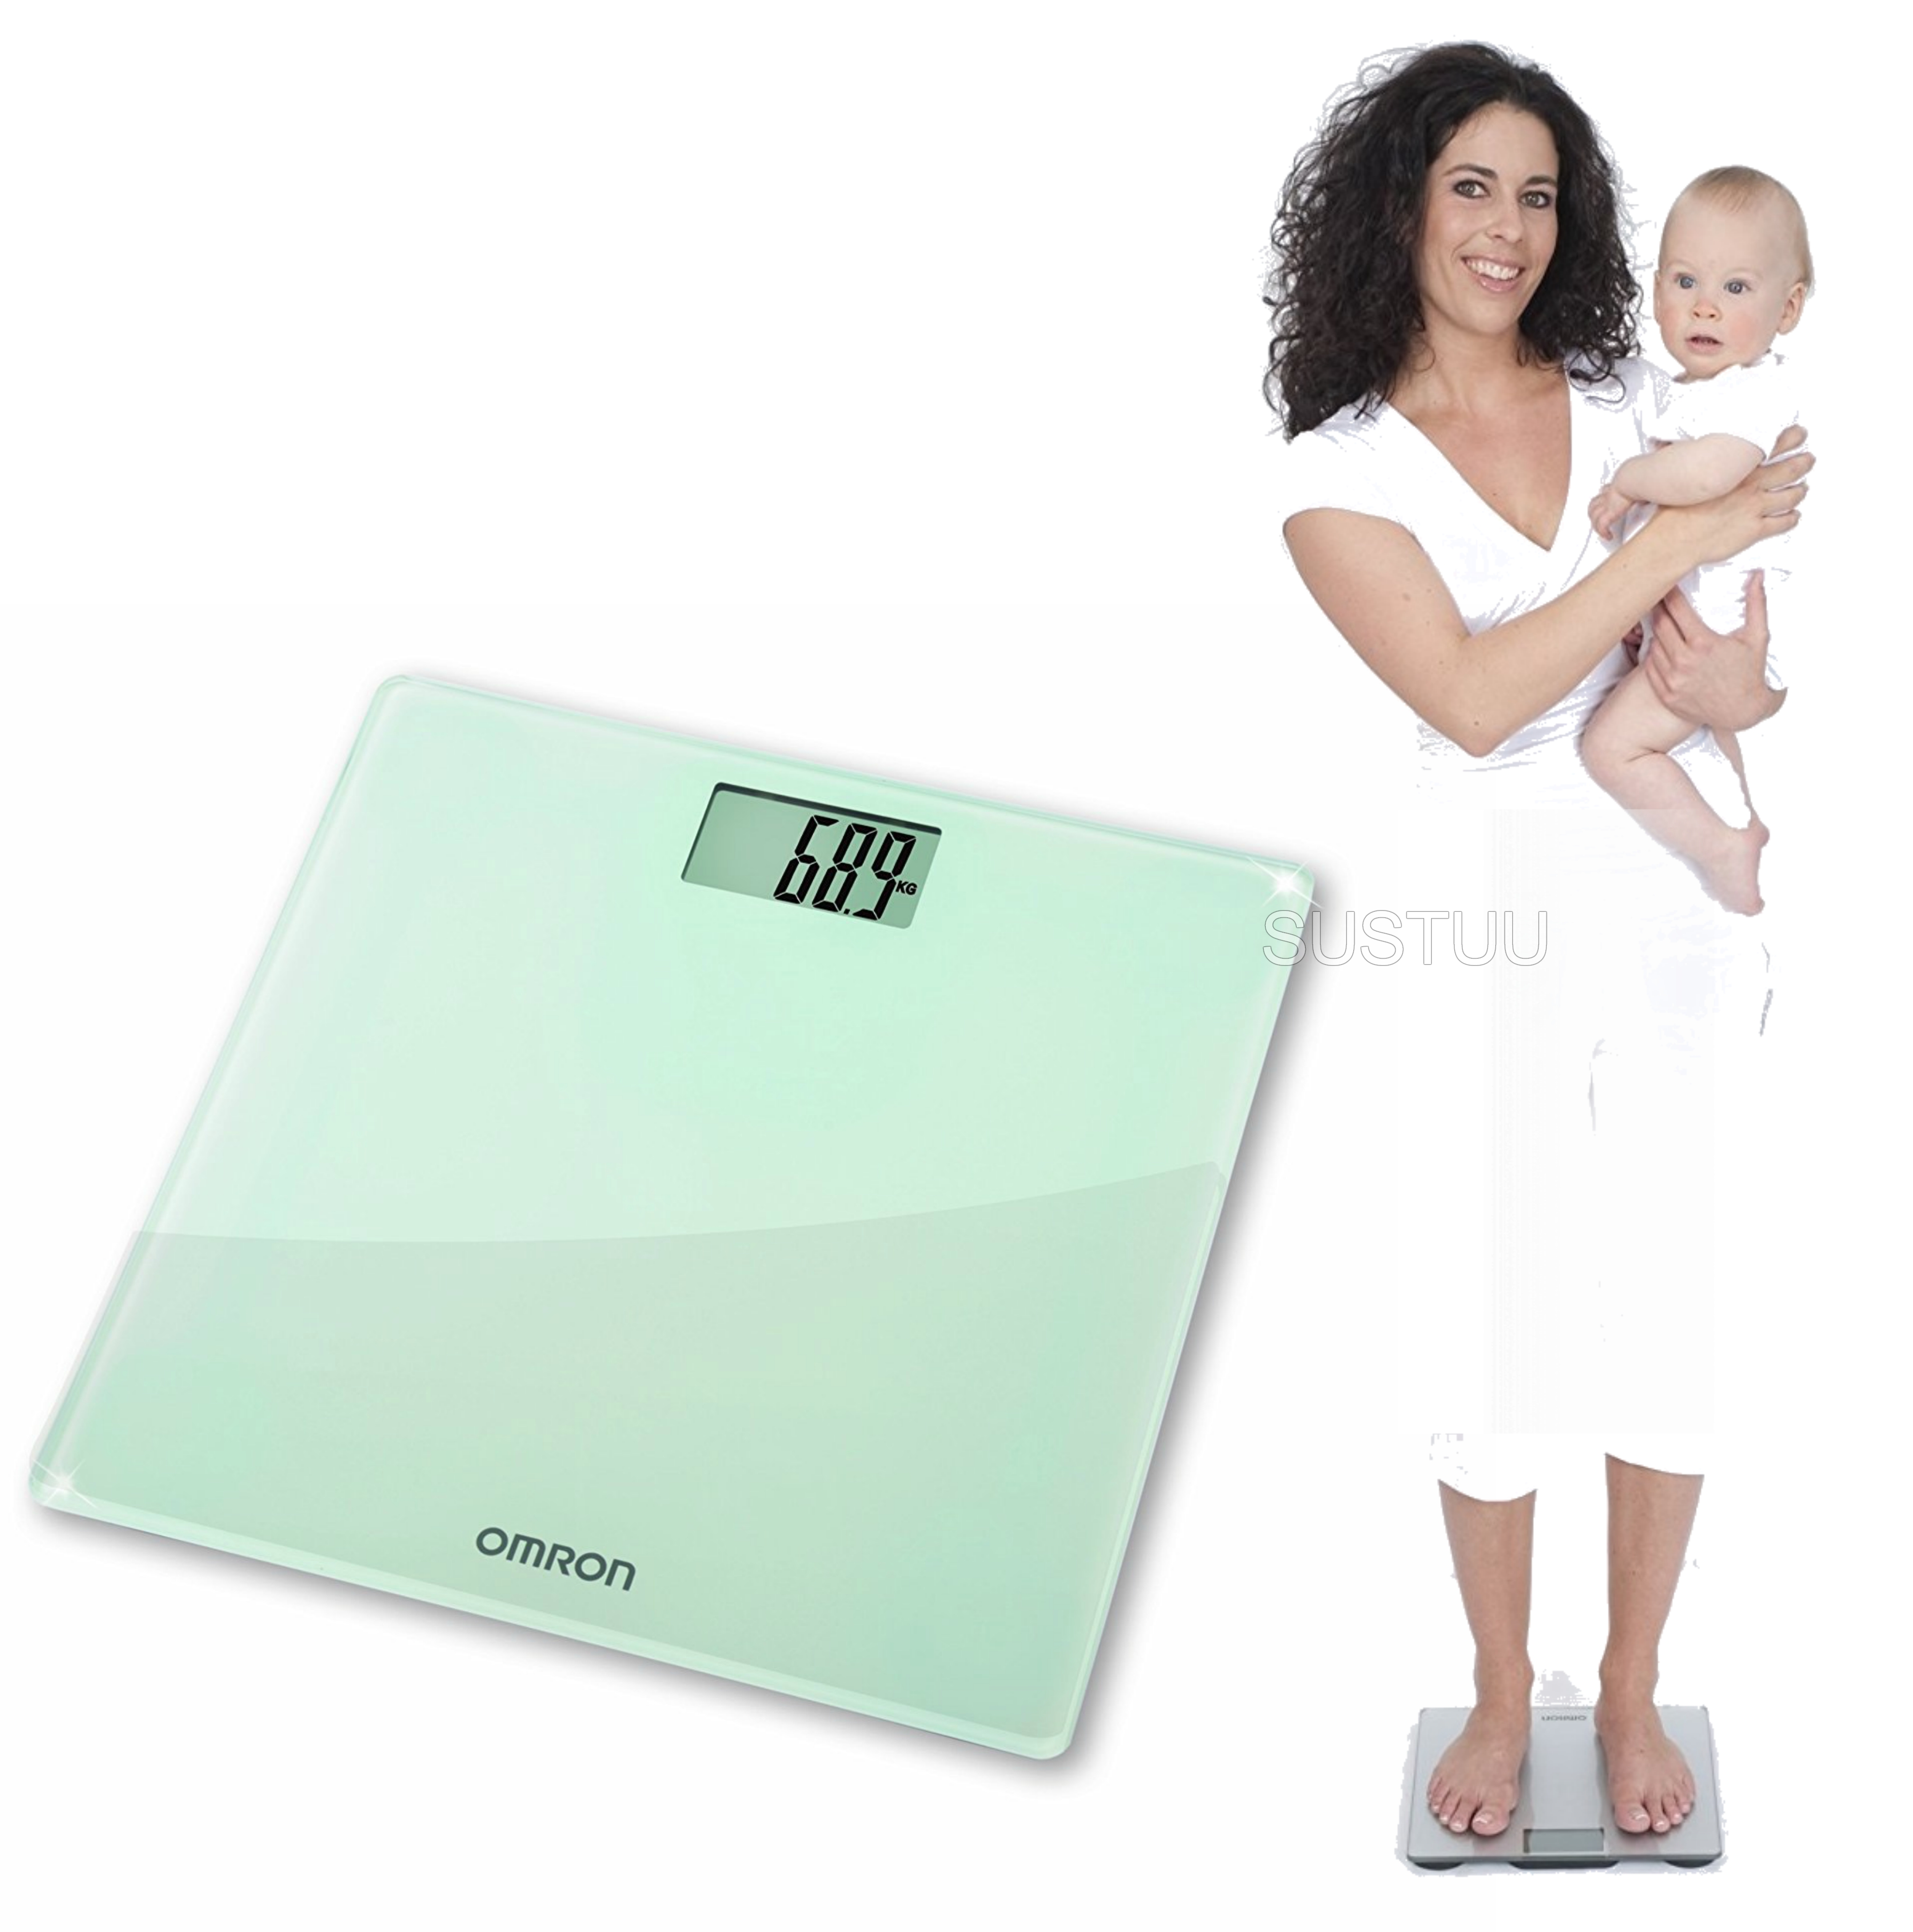 Omron HN286 Digital Slim Bathroom Scale?Personal Body Weight?LCD Display?Silver